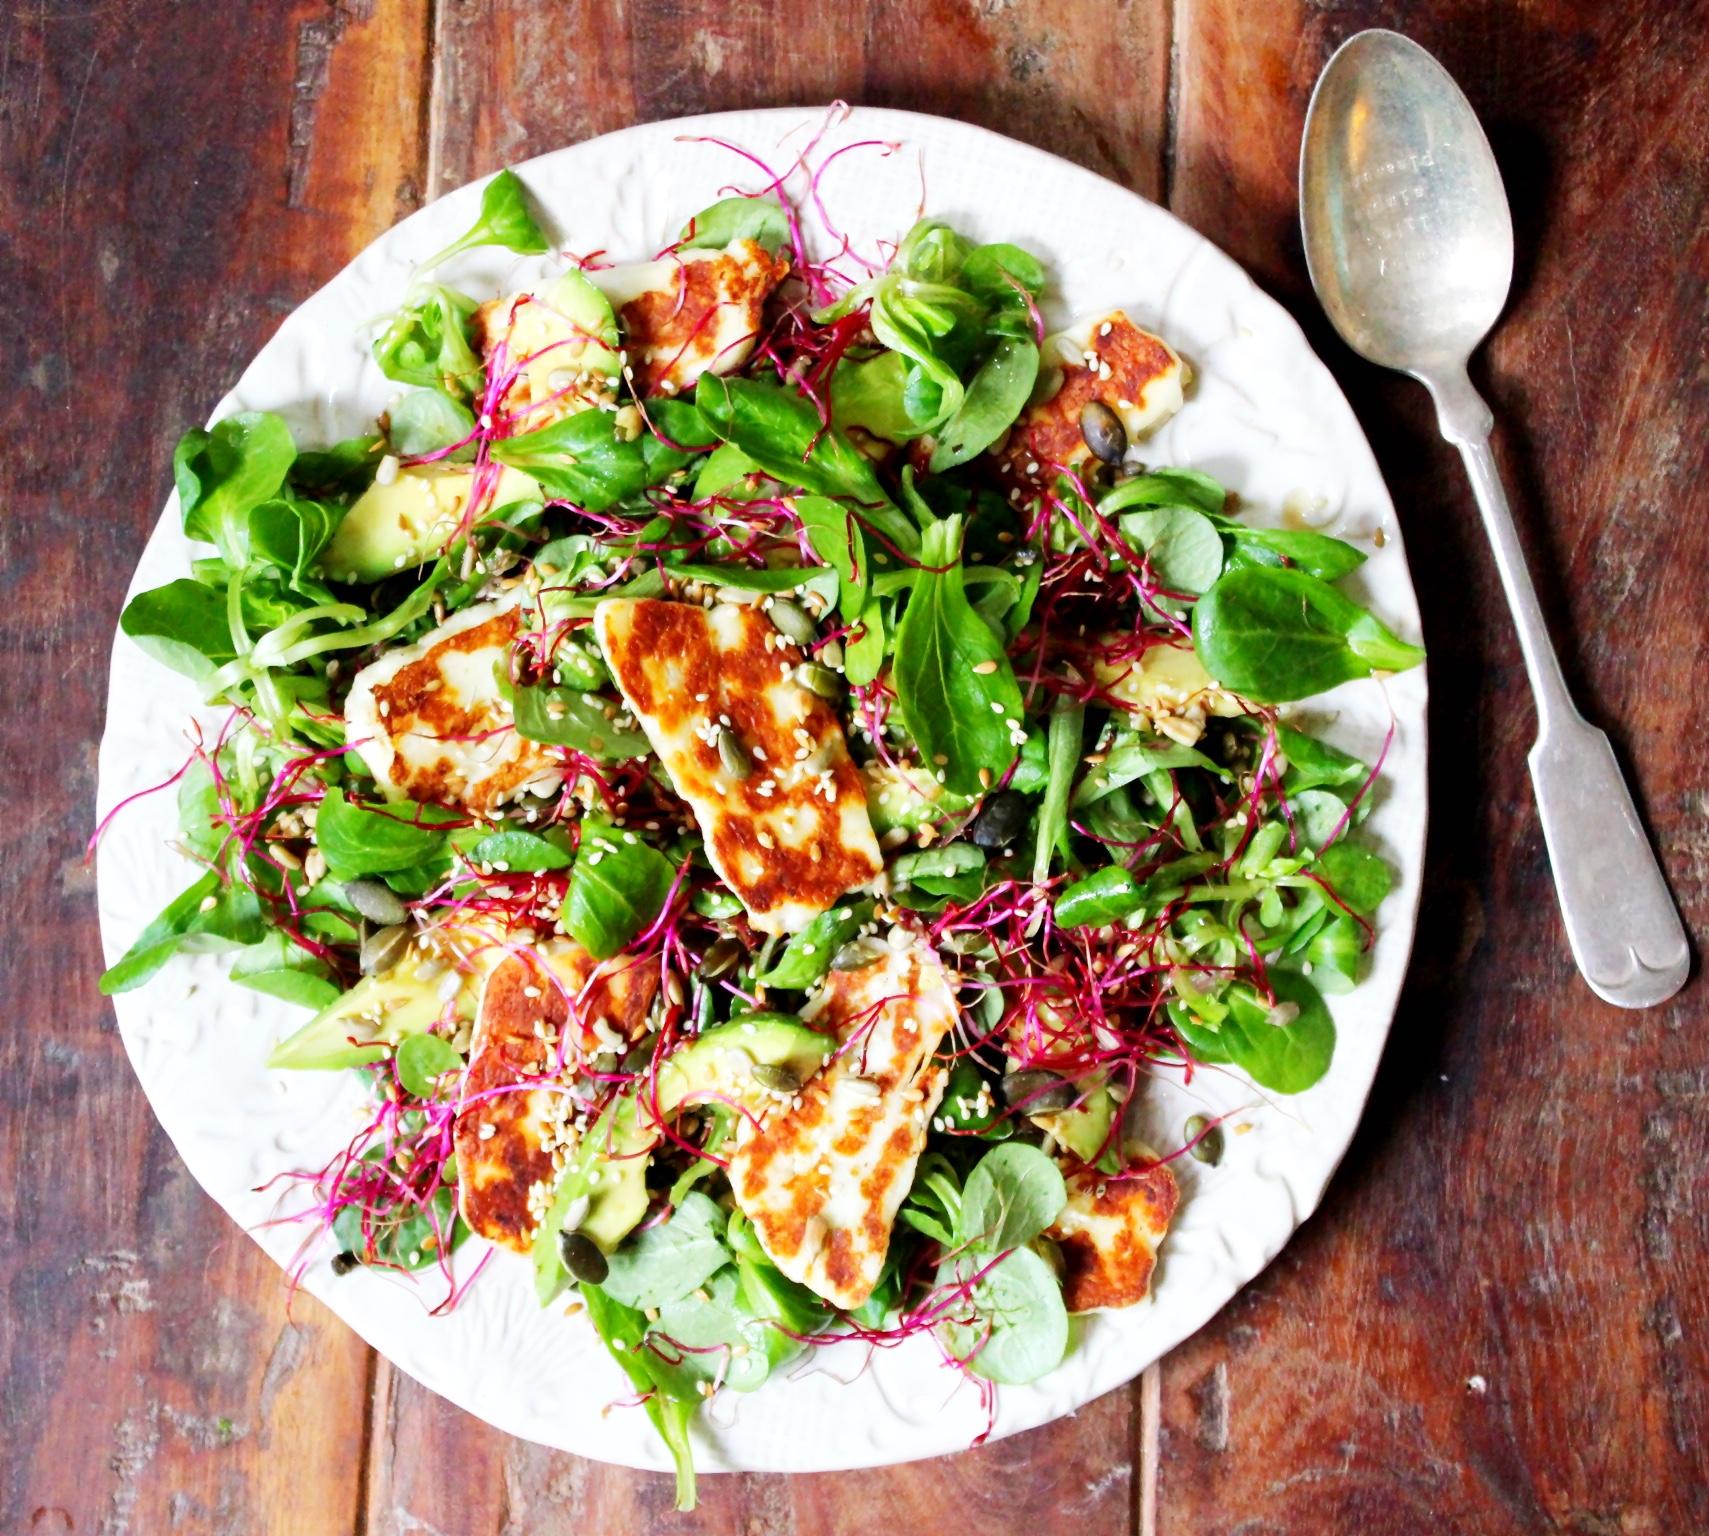 Halloumi, Avocado & Lime Salad - The Little Green Spoon